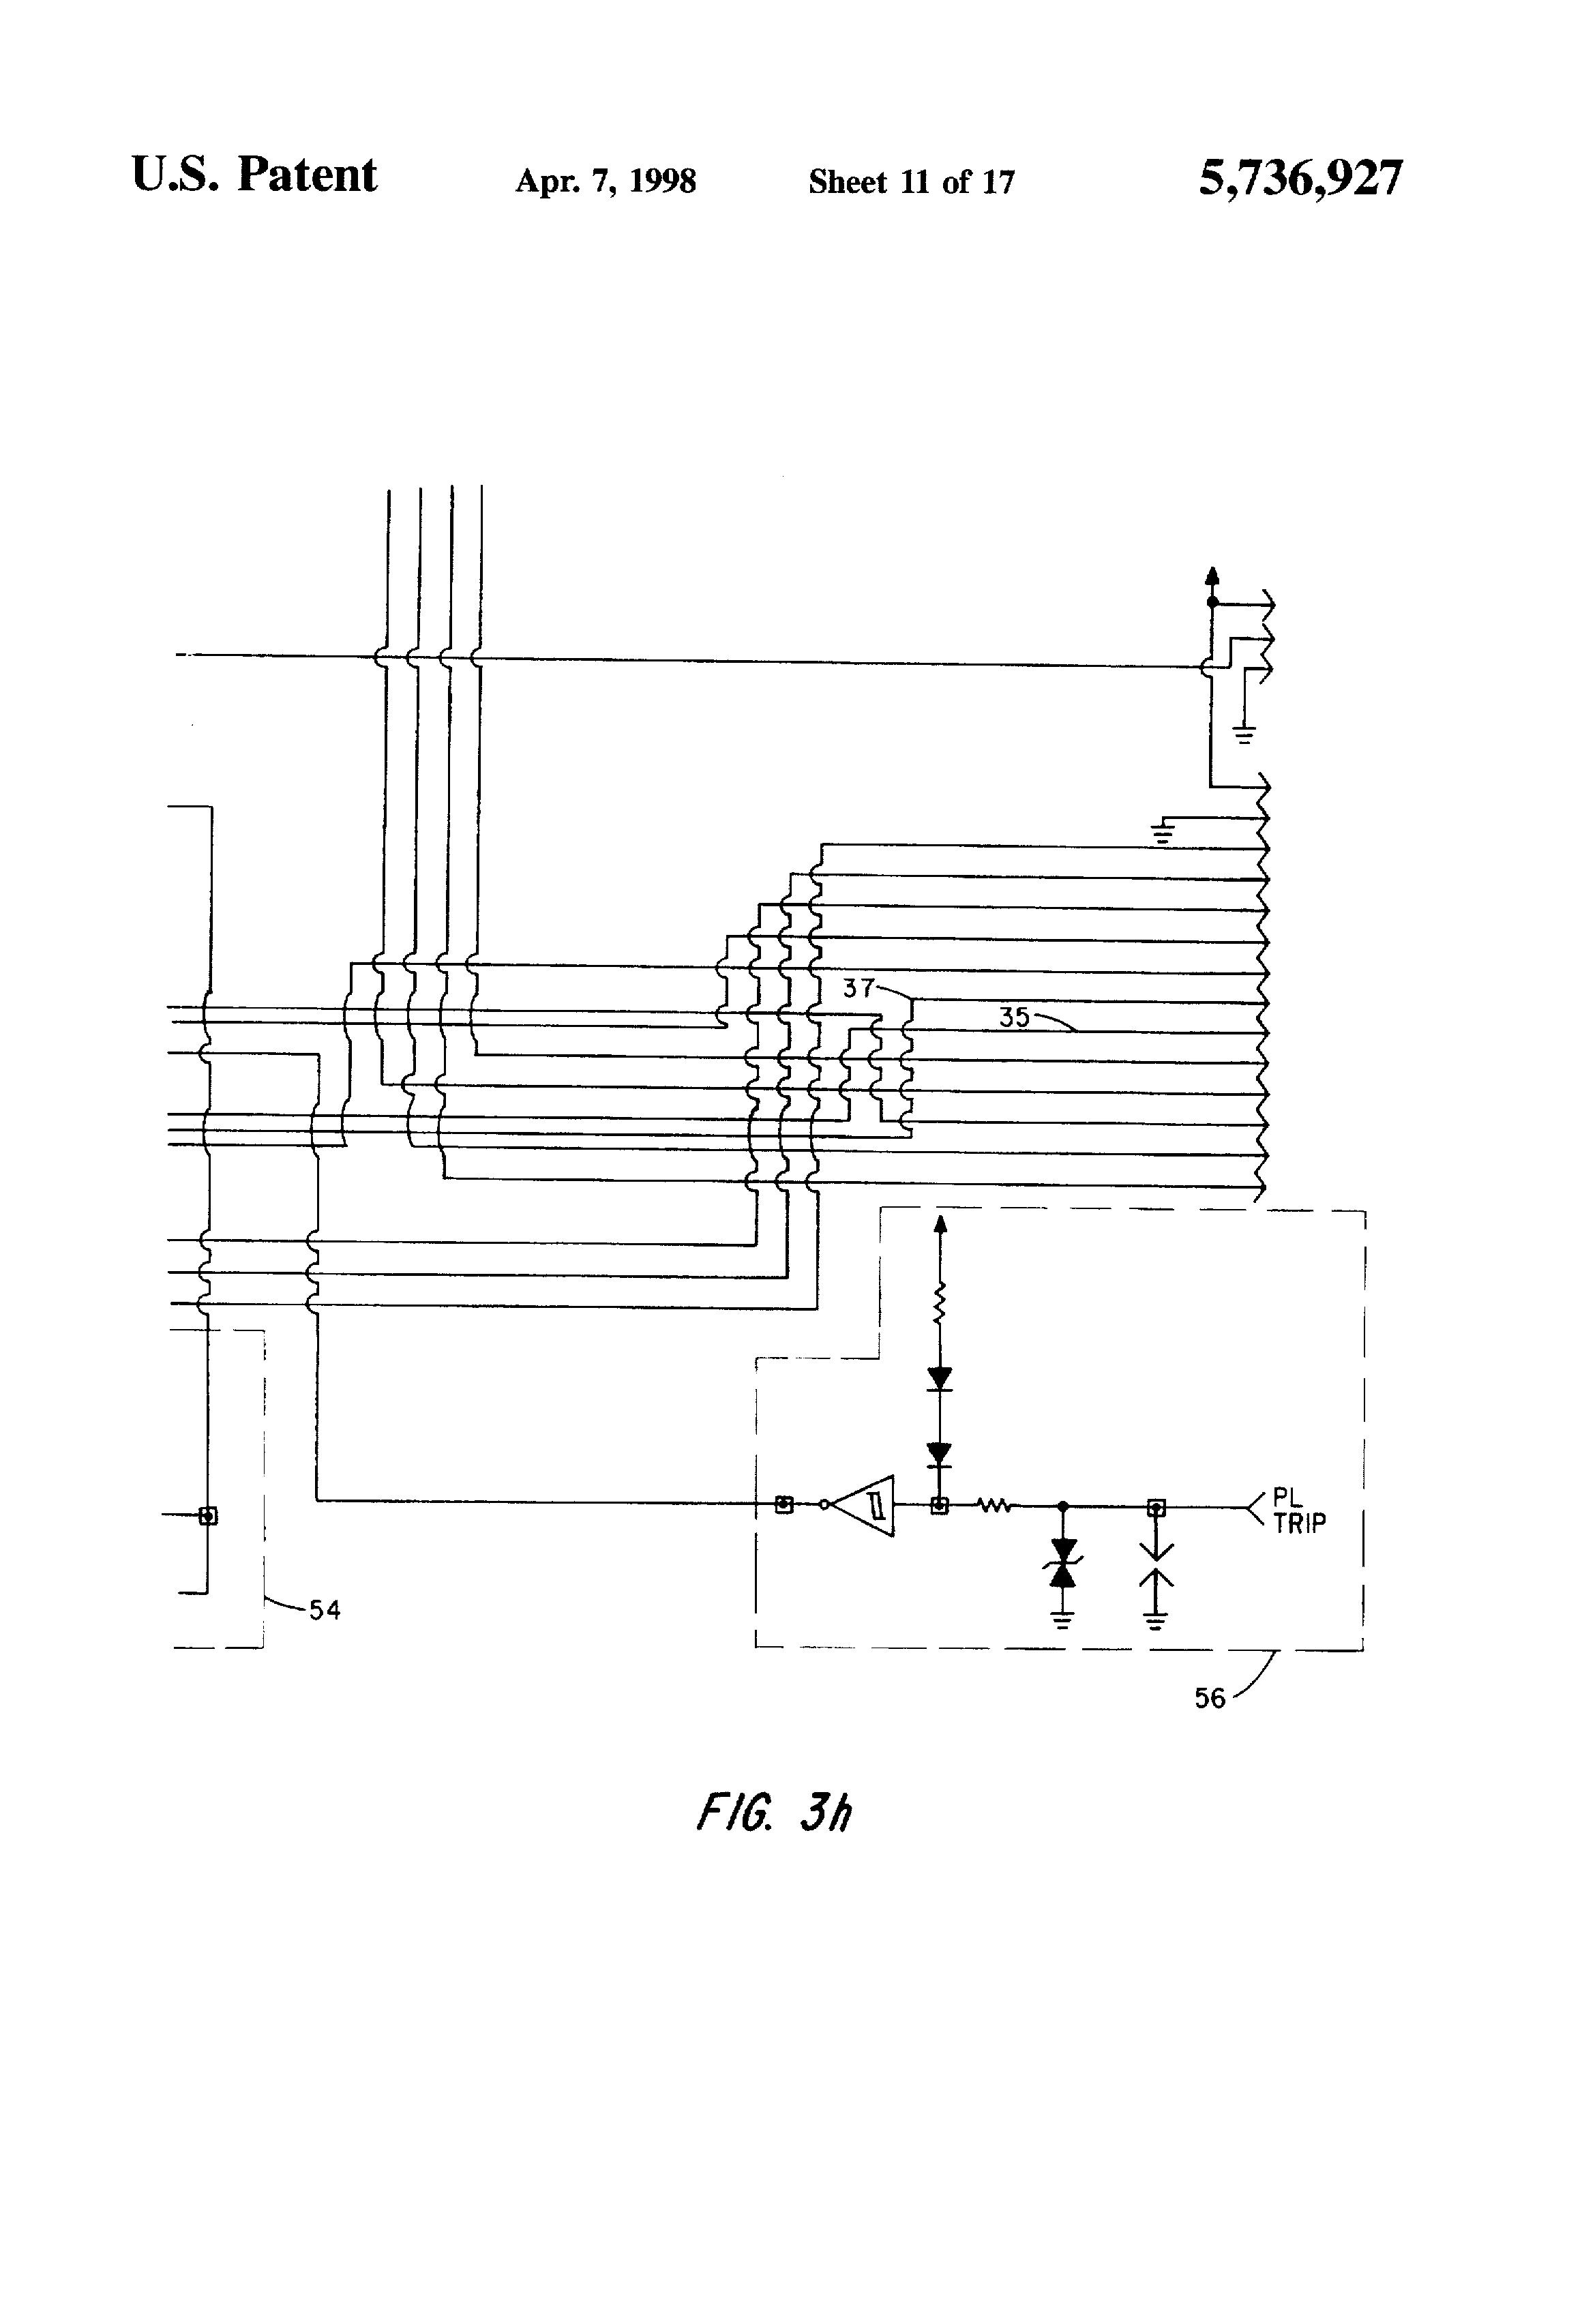 US5736927 11 sonitrol wiring diagram sonitrol user guide \u2022 wiring diagram sonitrol alarm wiring diagram at bakdesigns.co